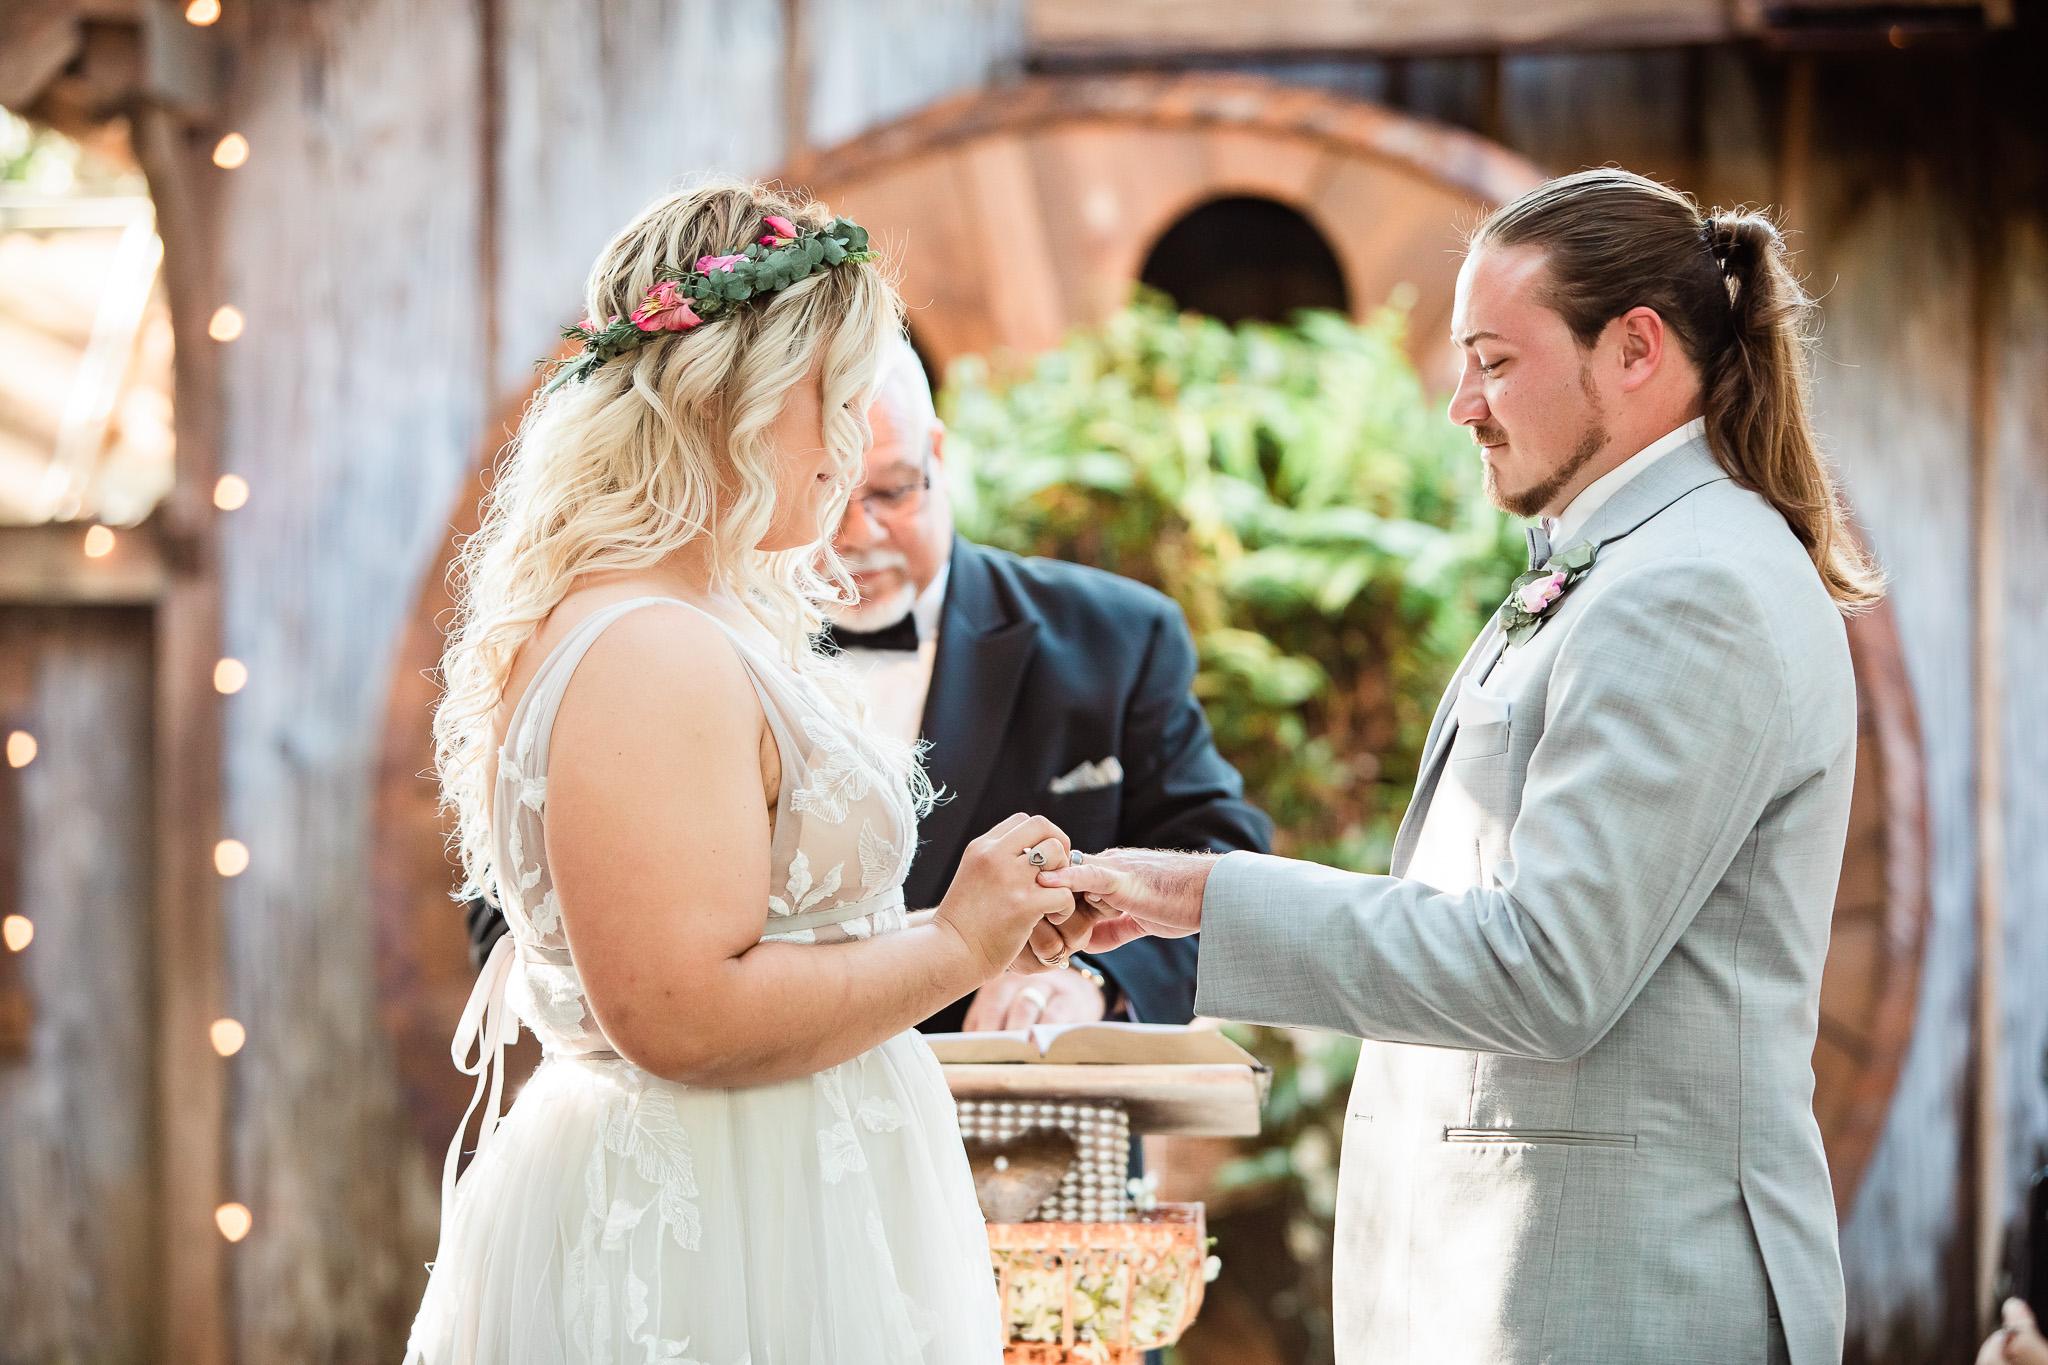 TAMPA_WEDDING_GIGIS_COUNTRY_GARDEN_CJMZ_TJL48258.jpg